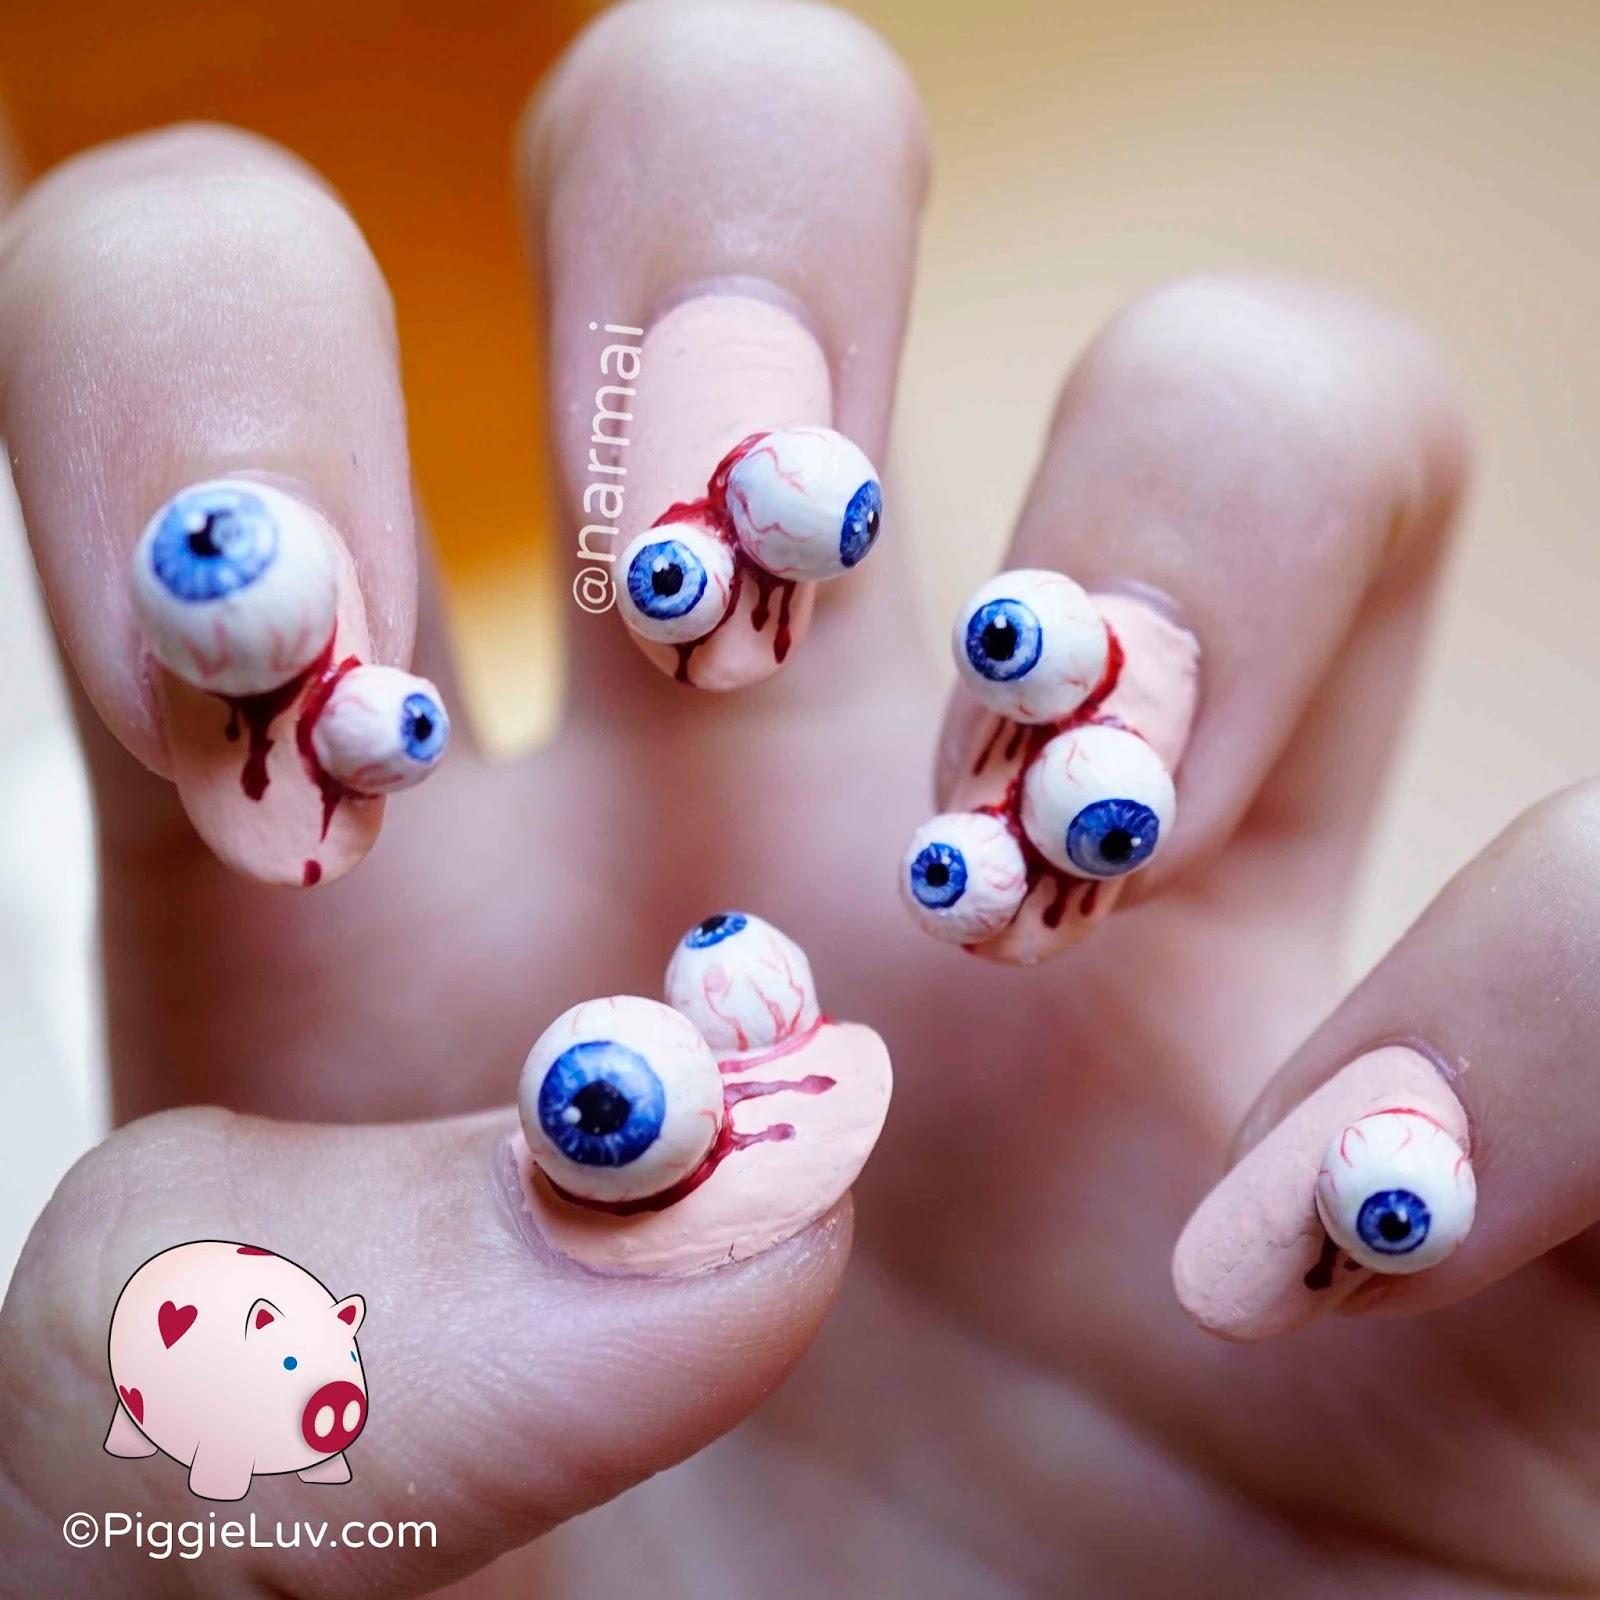 PiggieLuv: Nail art gallery